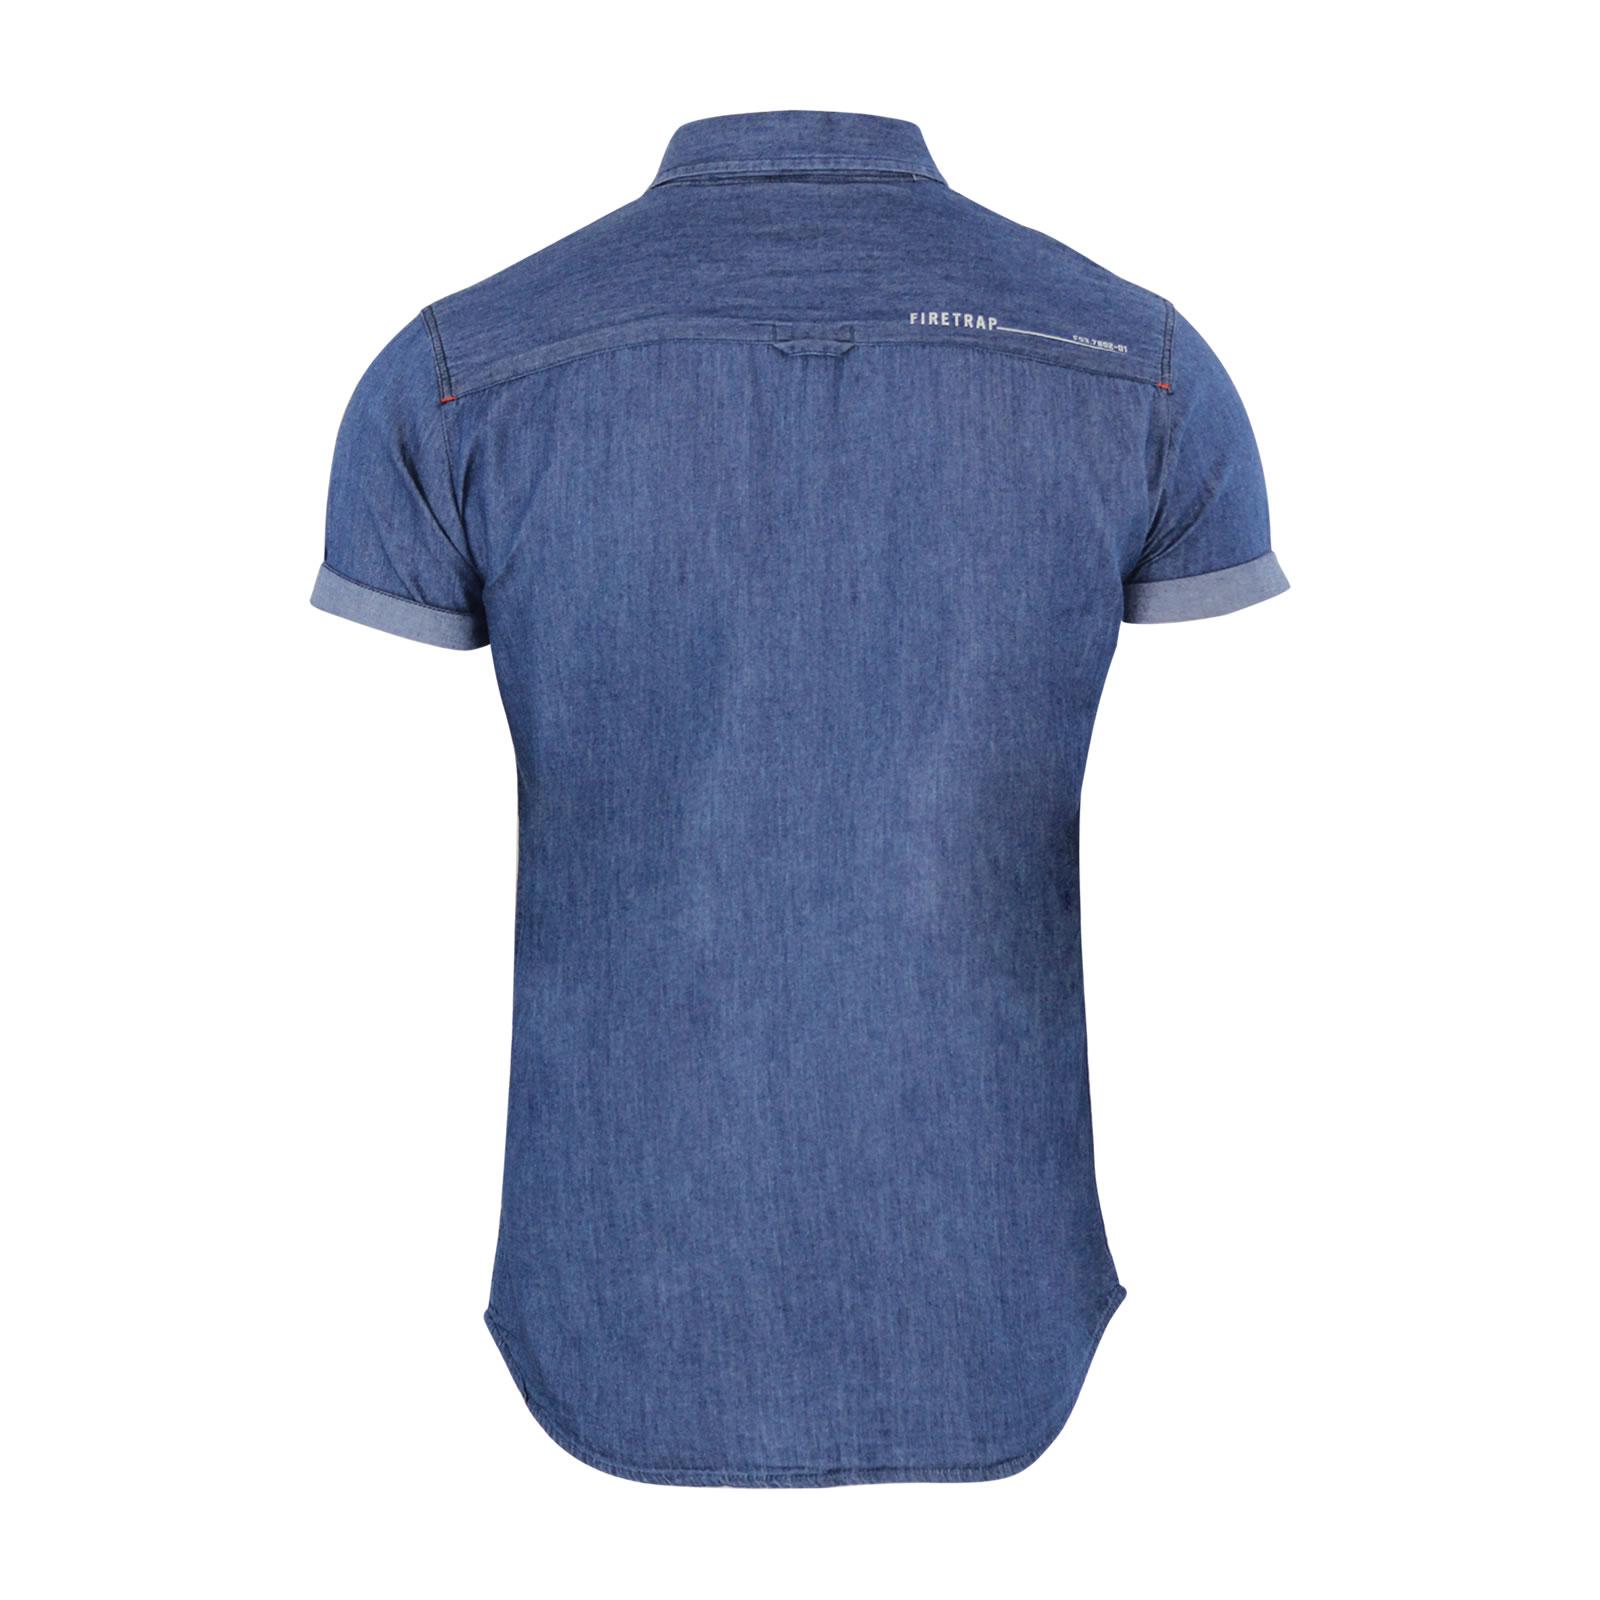 Mens Denim Shirt Firetrap Barley Chambray Collared Short